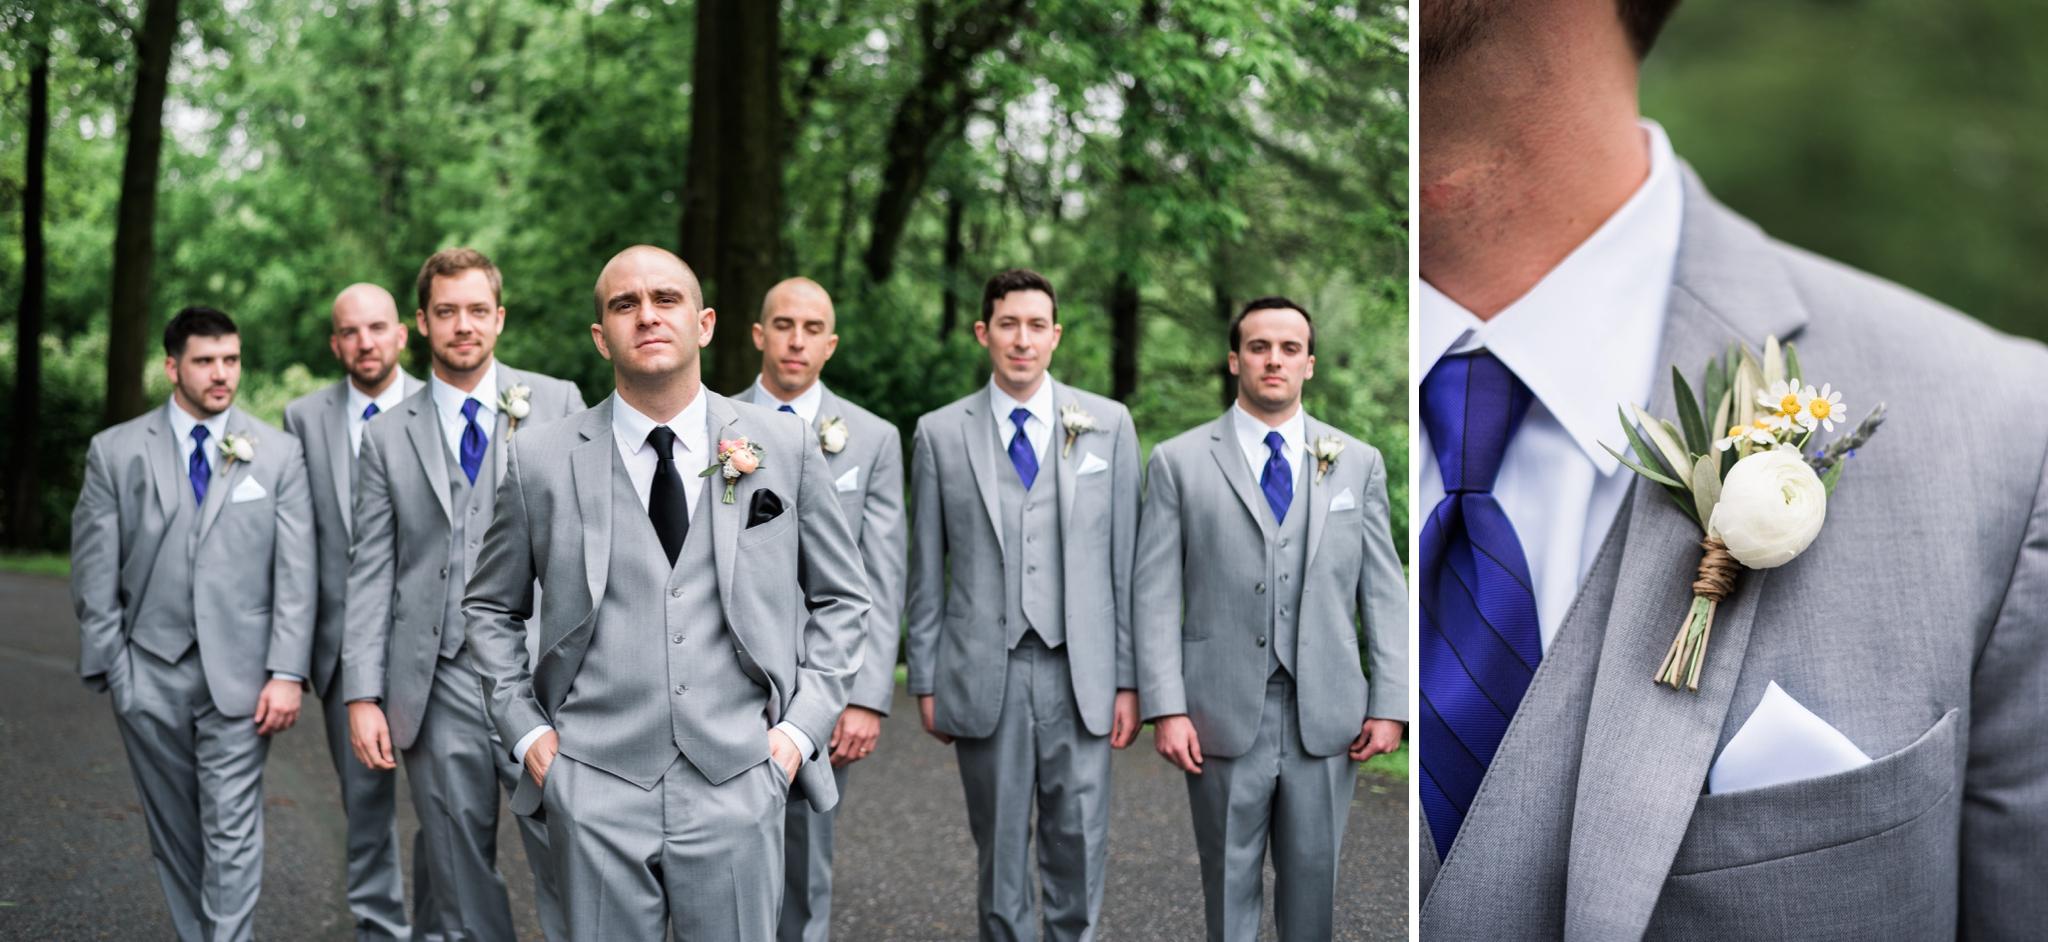 Emily Grace Photography, Lancaster PA Wedding Photographer, Riverdale Manor Wedding